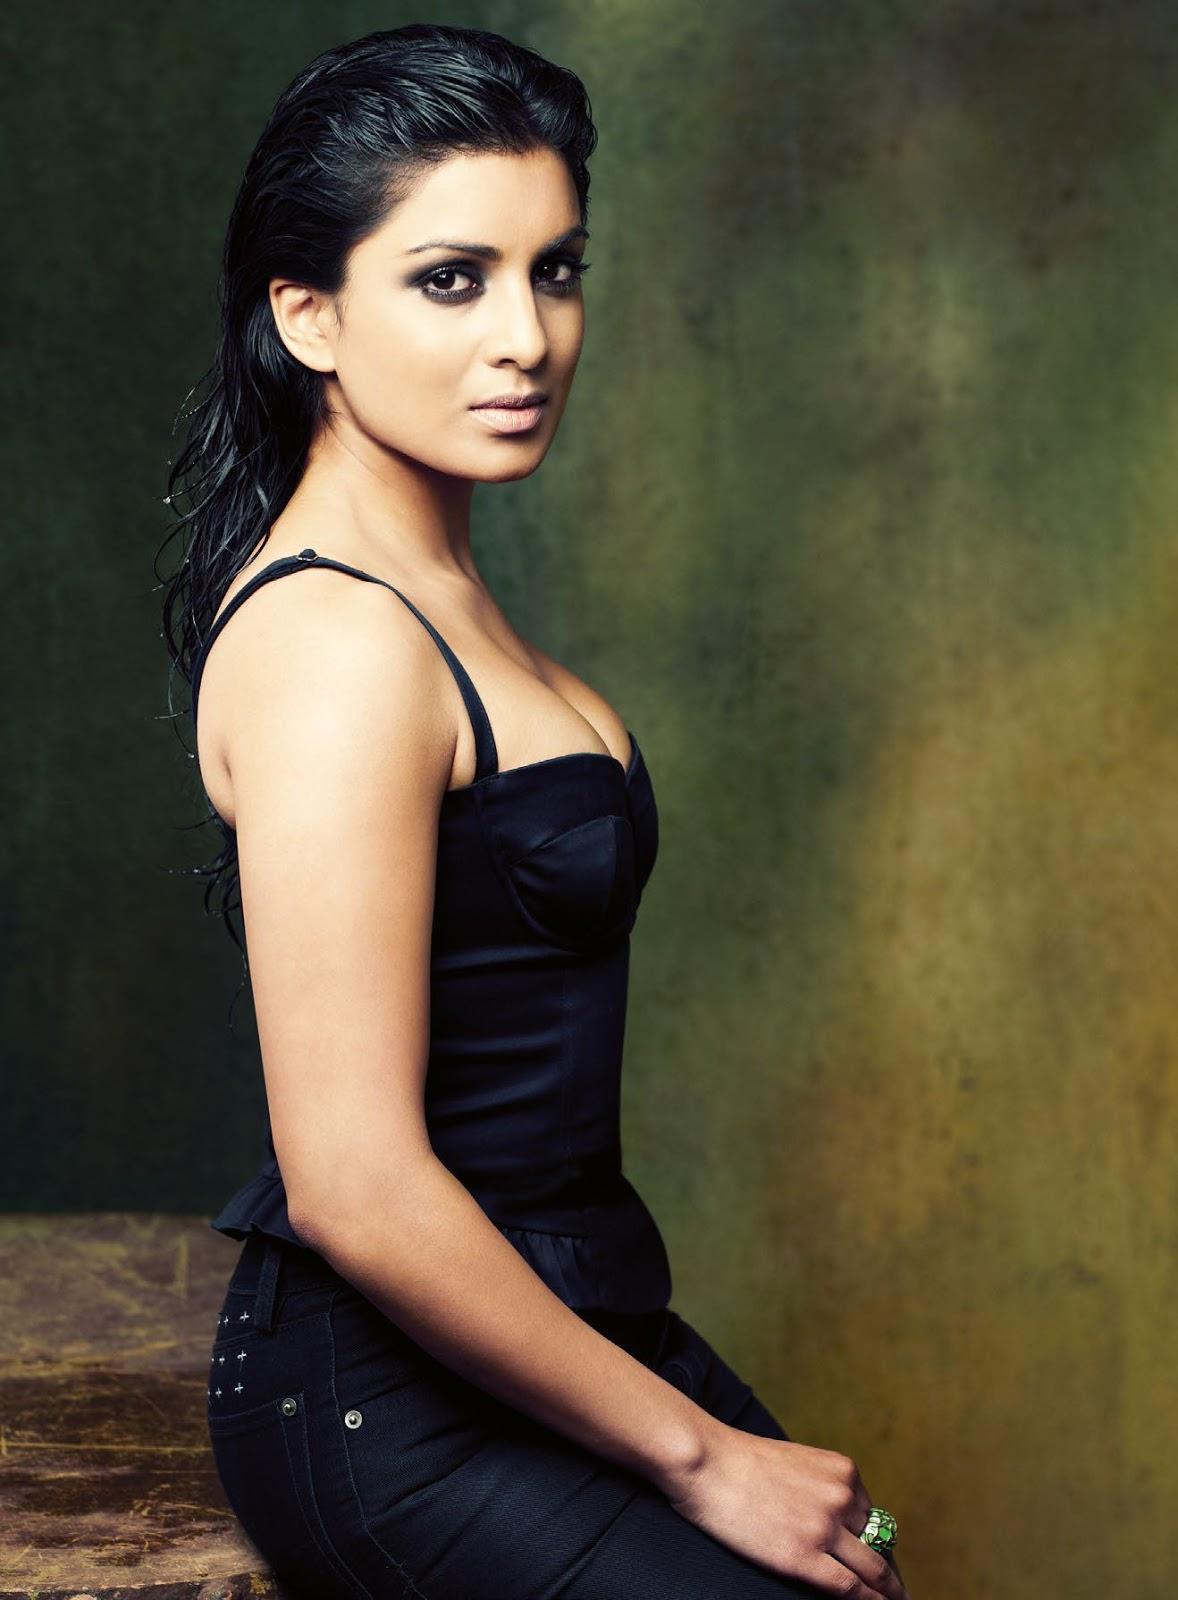 Pallavi-Sharda-Sexy-Look Pallavi Sharda 11+ Unseen Bikini Picture Swimsuit Pictures Age & Ft Wiki